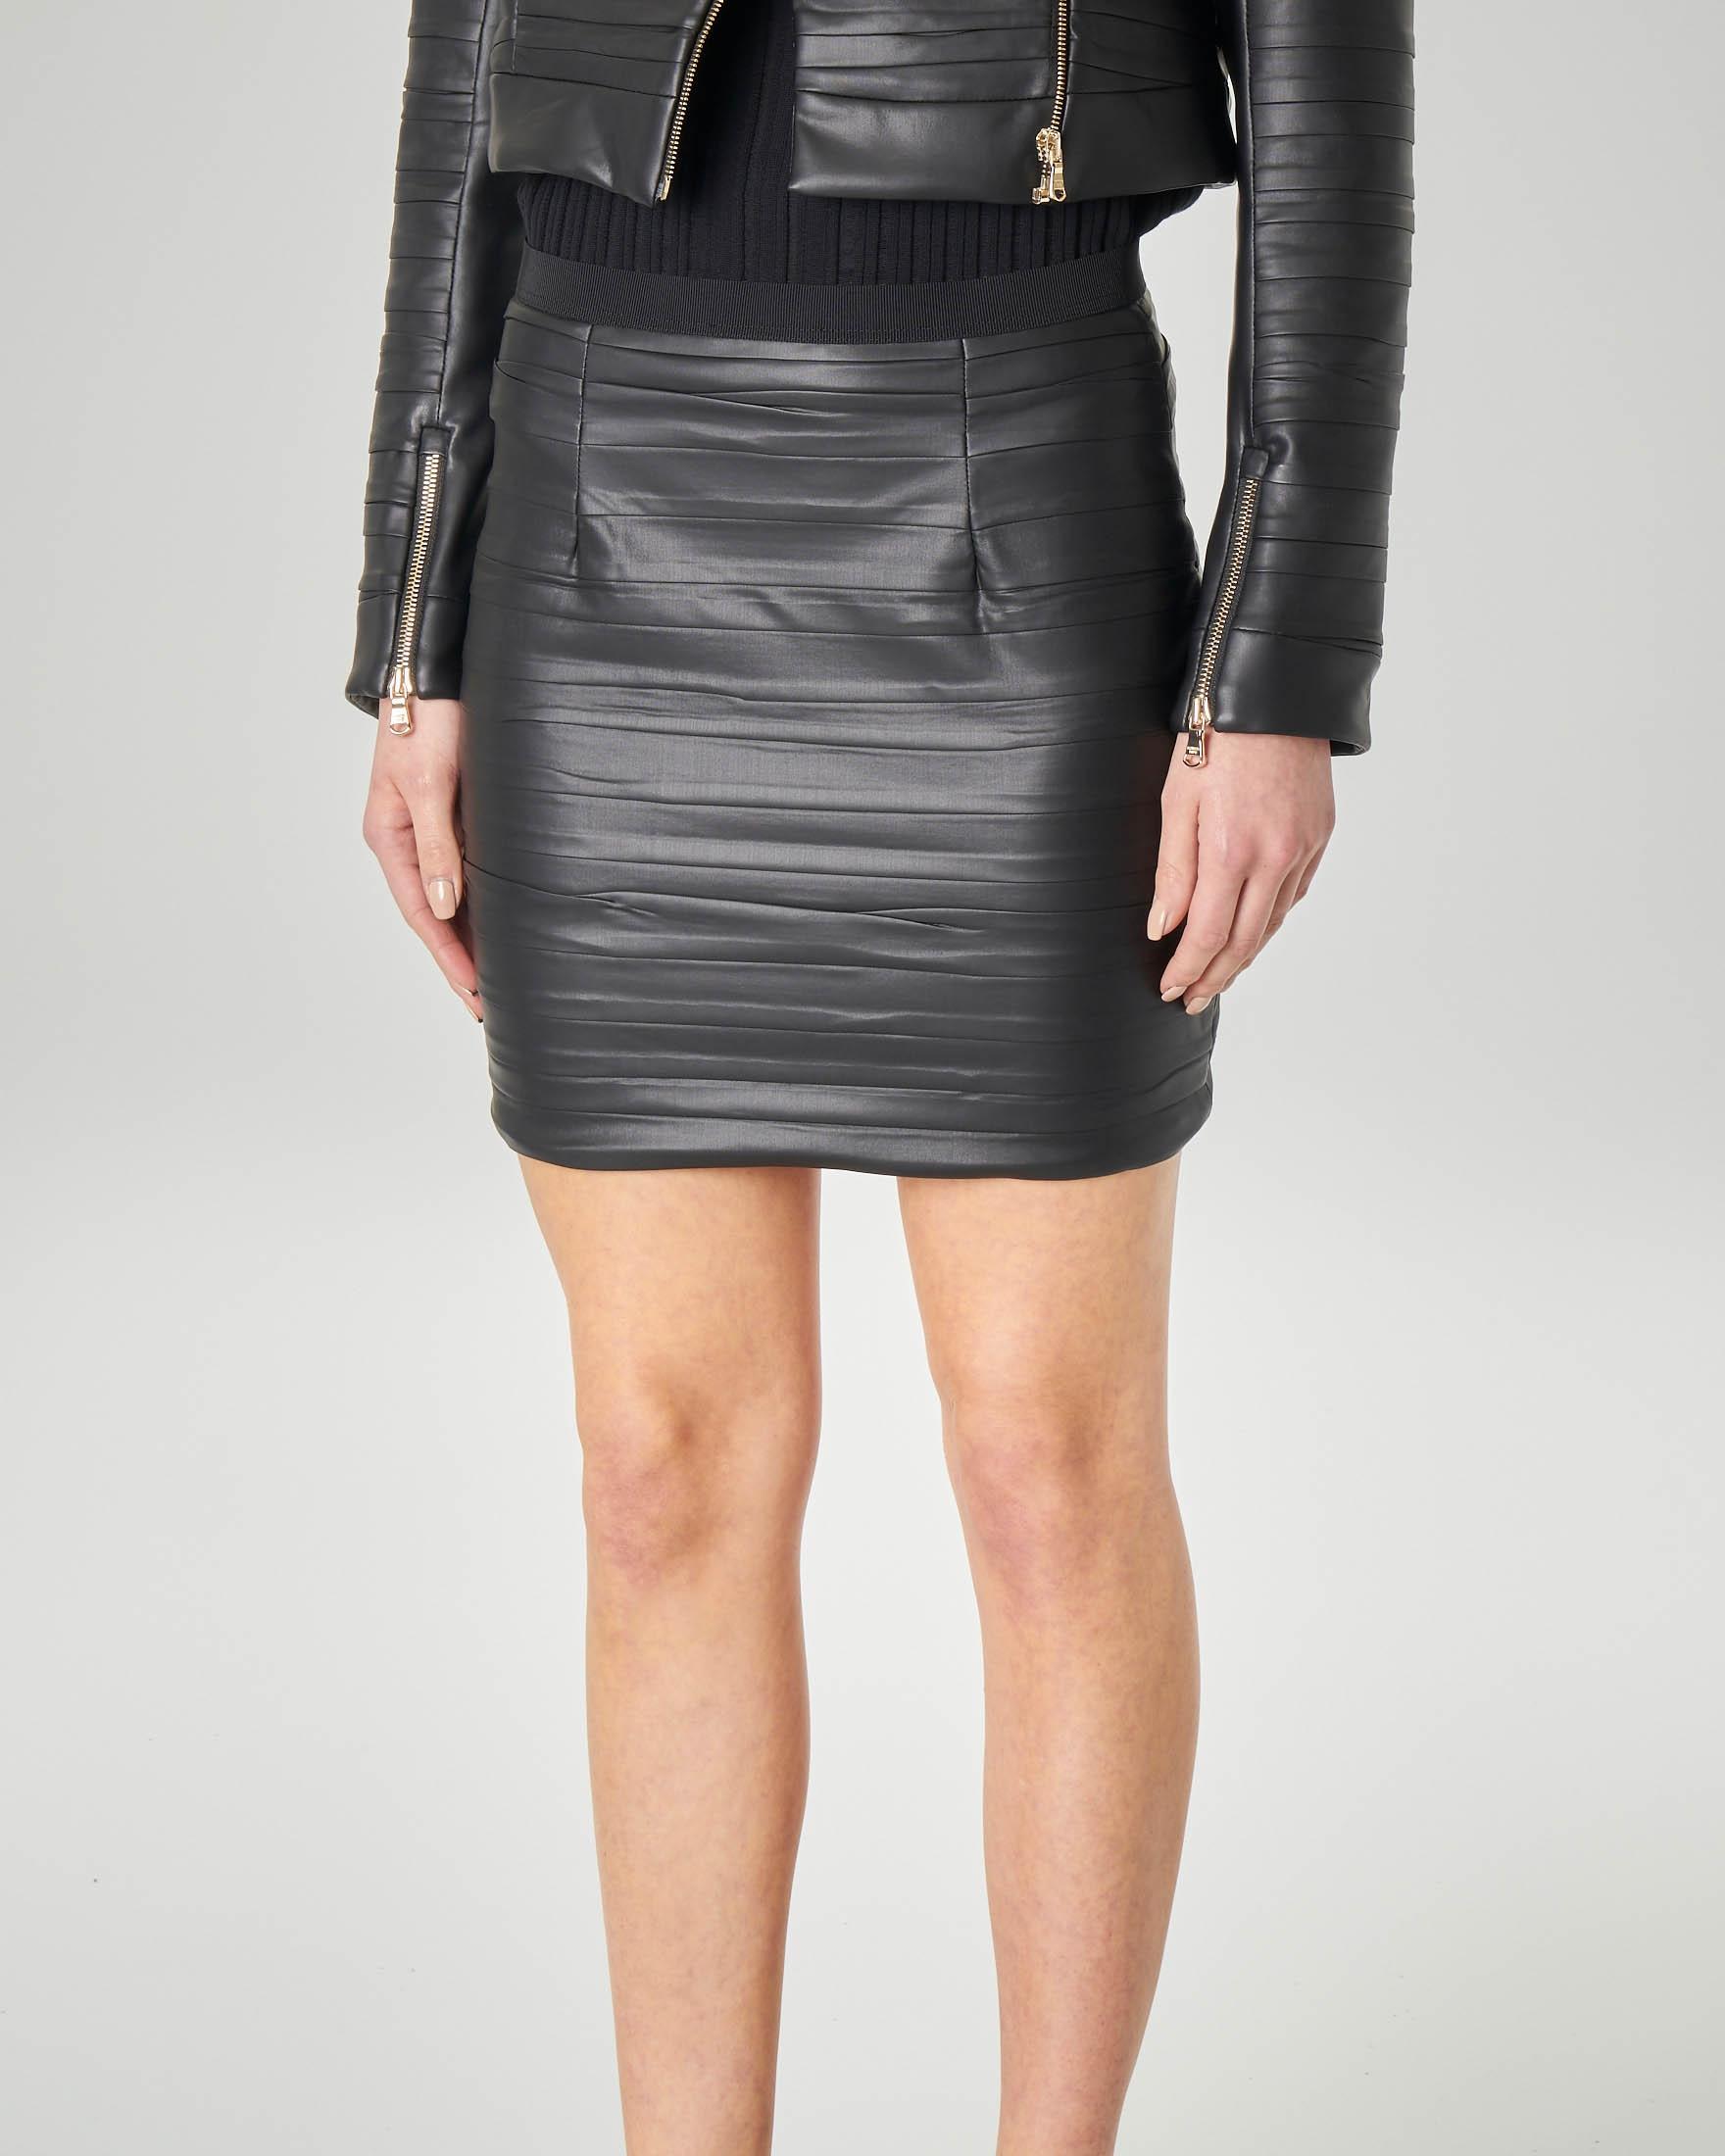 hot sale online 37d41 fb650 Minigonna nera in ecopelle effetto goffrato